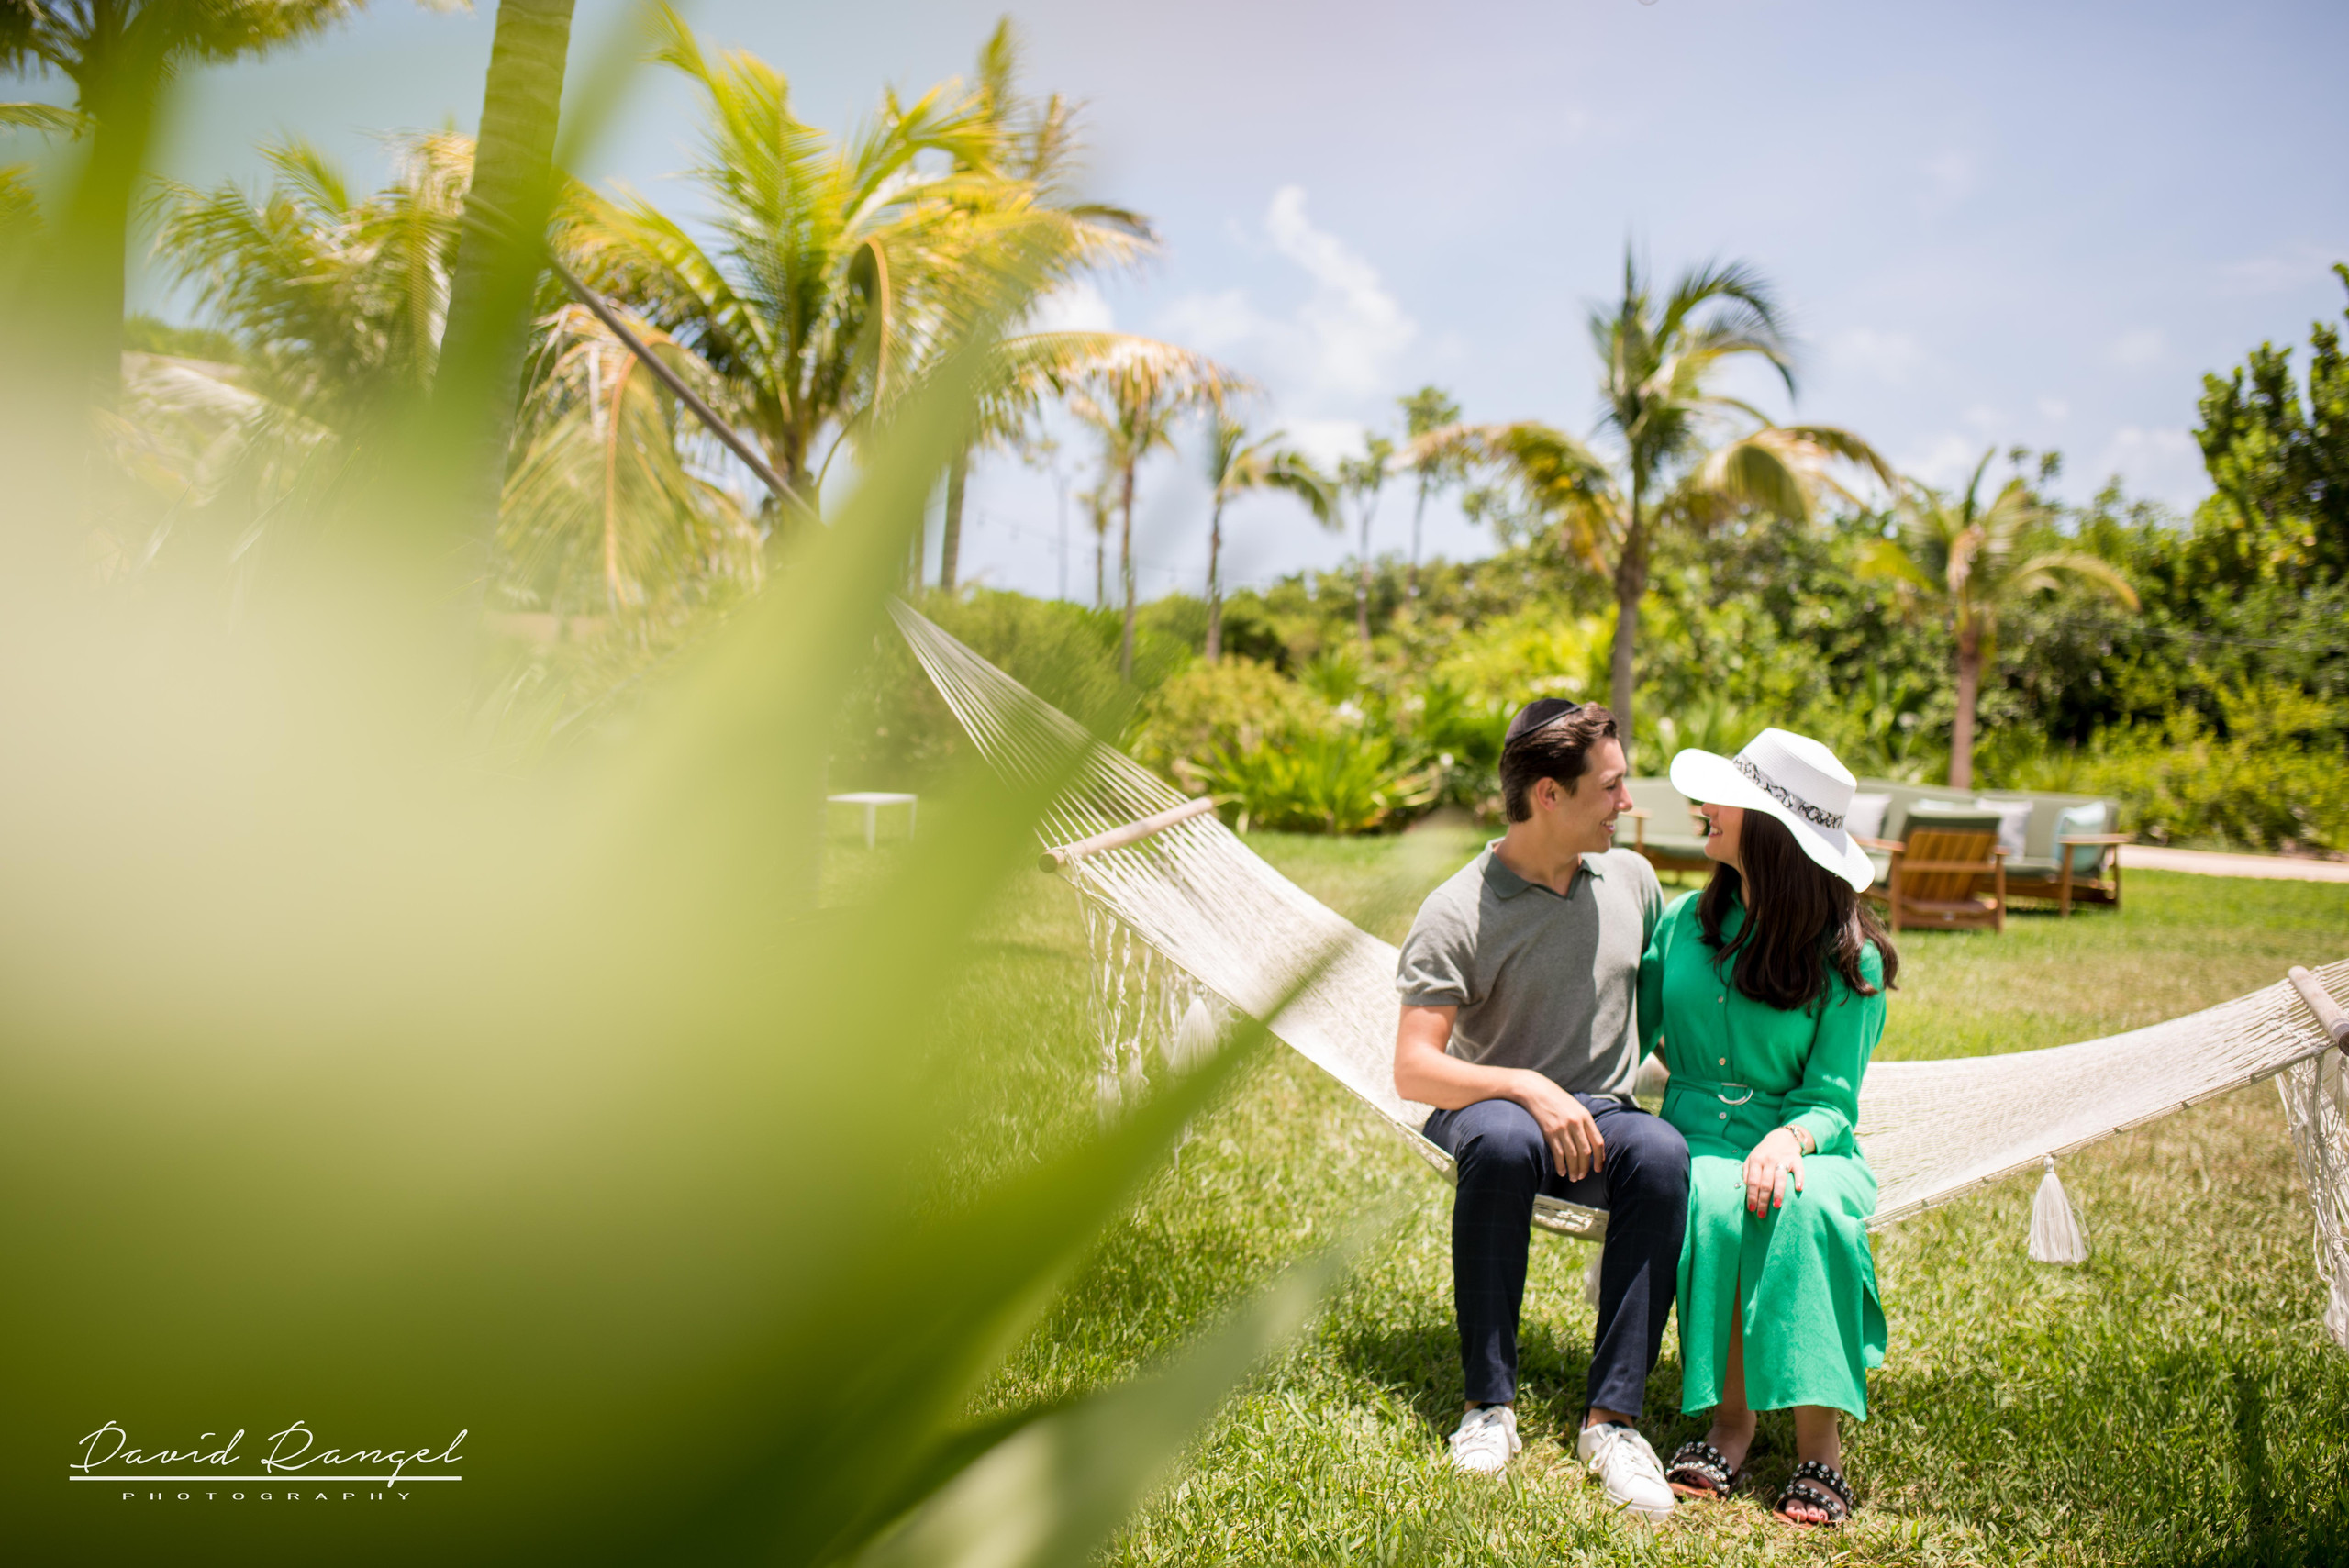 couple+hotel+atelier+happy+love+together+playa+mujeres+destination+photographer+photo+garden+trees+kiss+hamac+hat